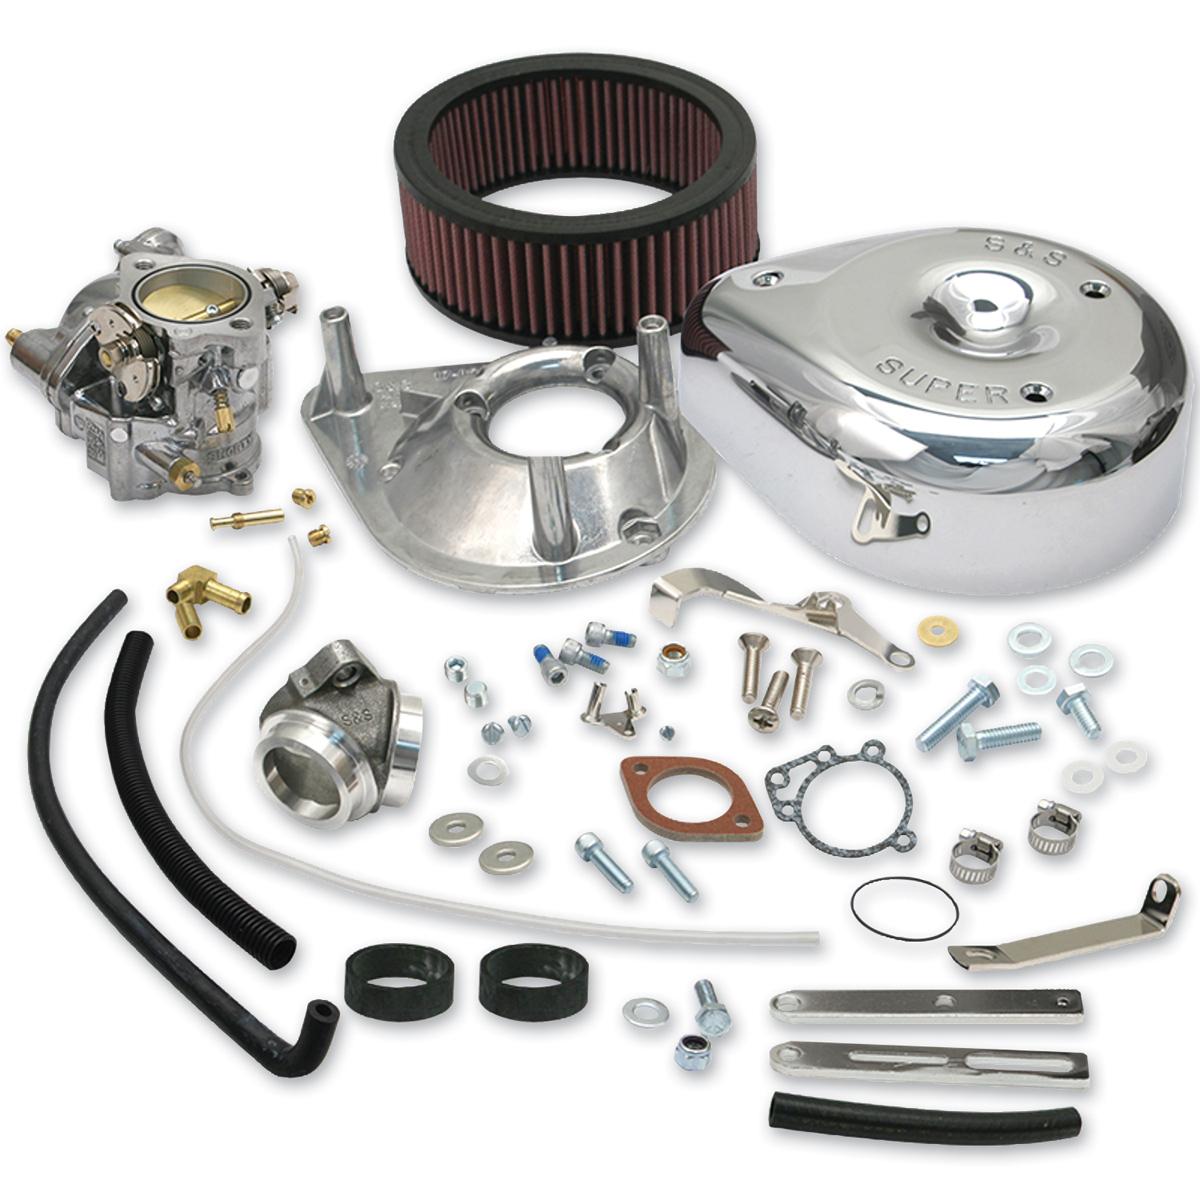 S&S Cycle Super 'E' Complete Carburetor Kit - 11-0411